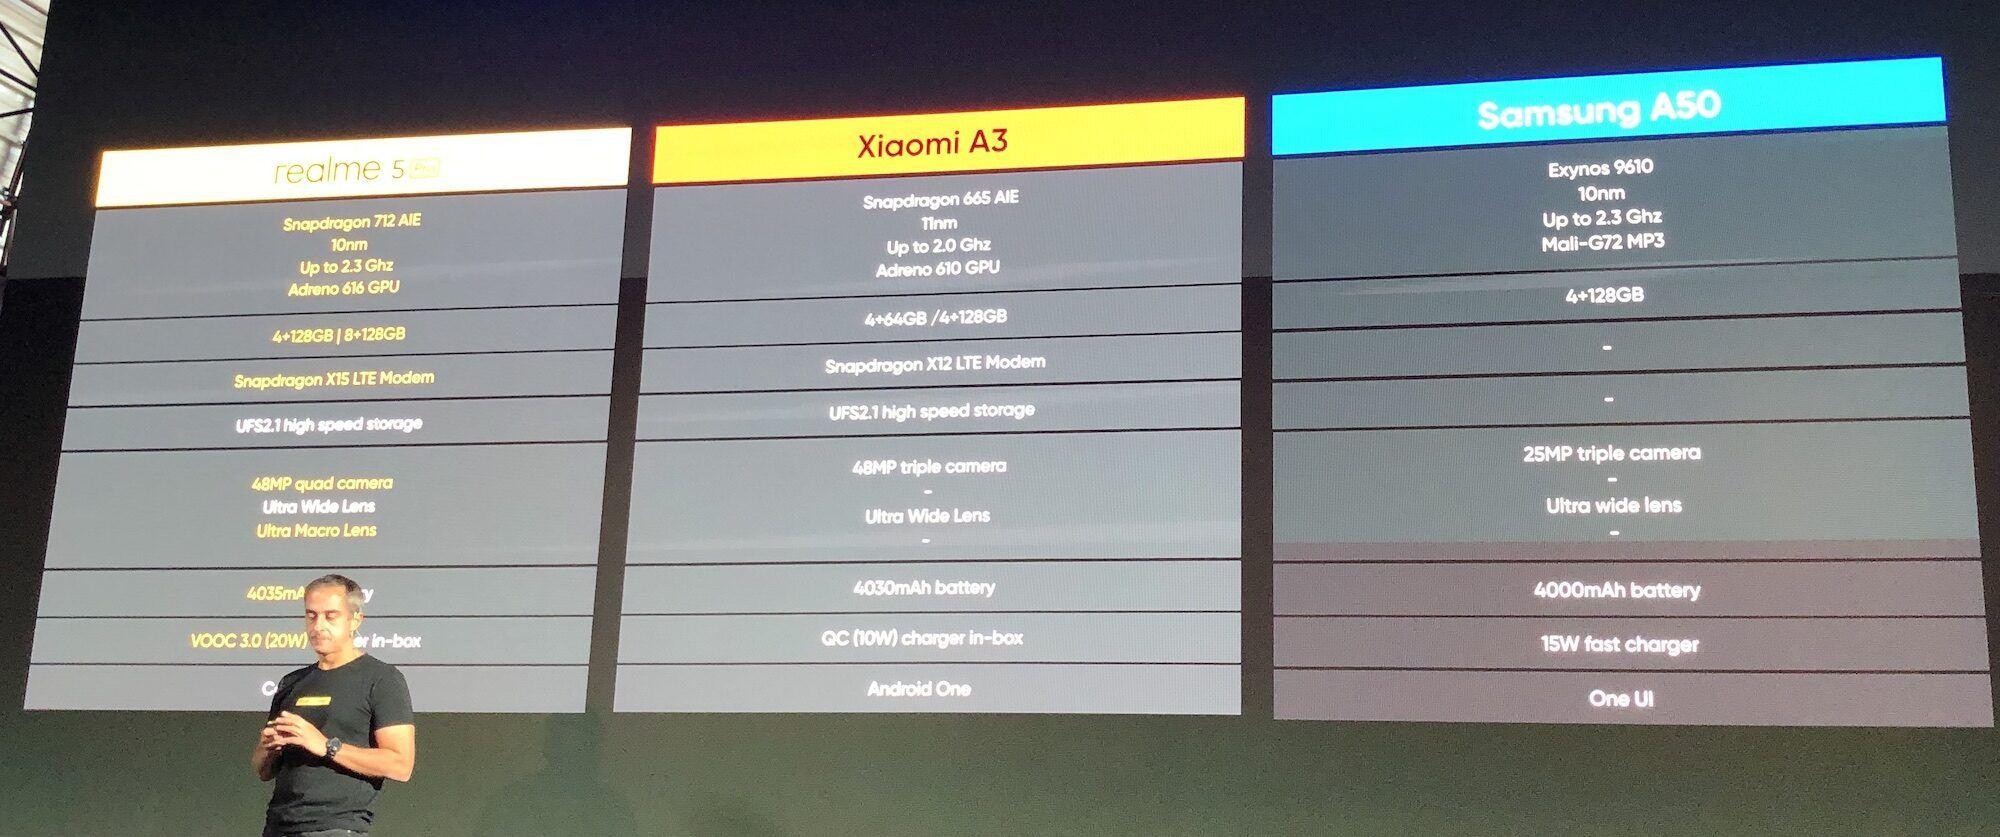 Realme 5 Pro comparé au Xiaomi A3